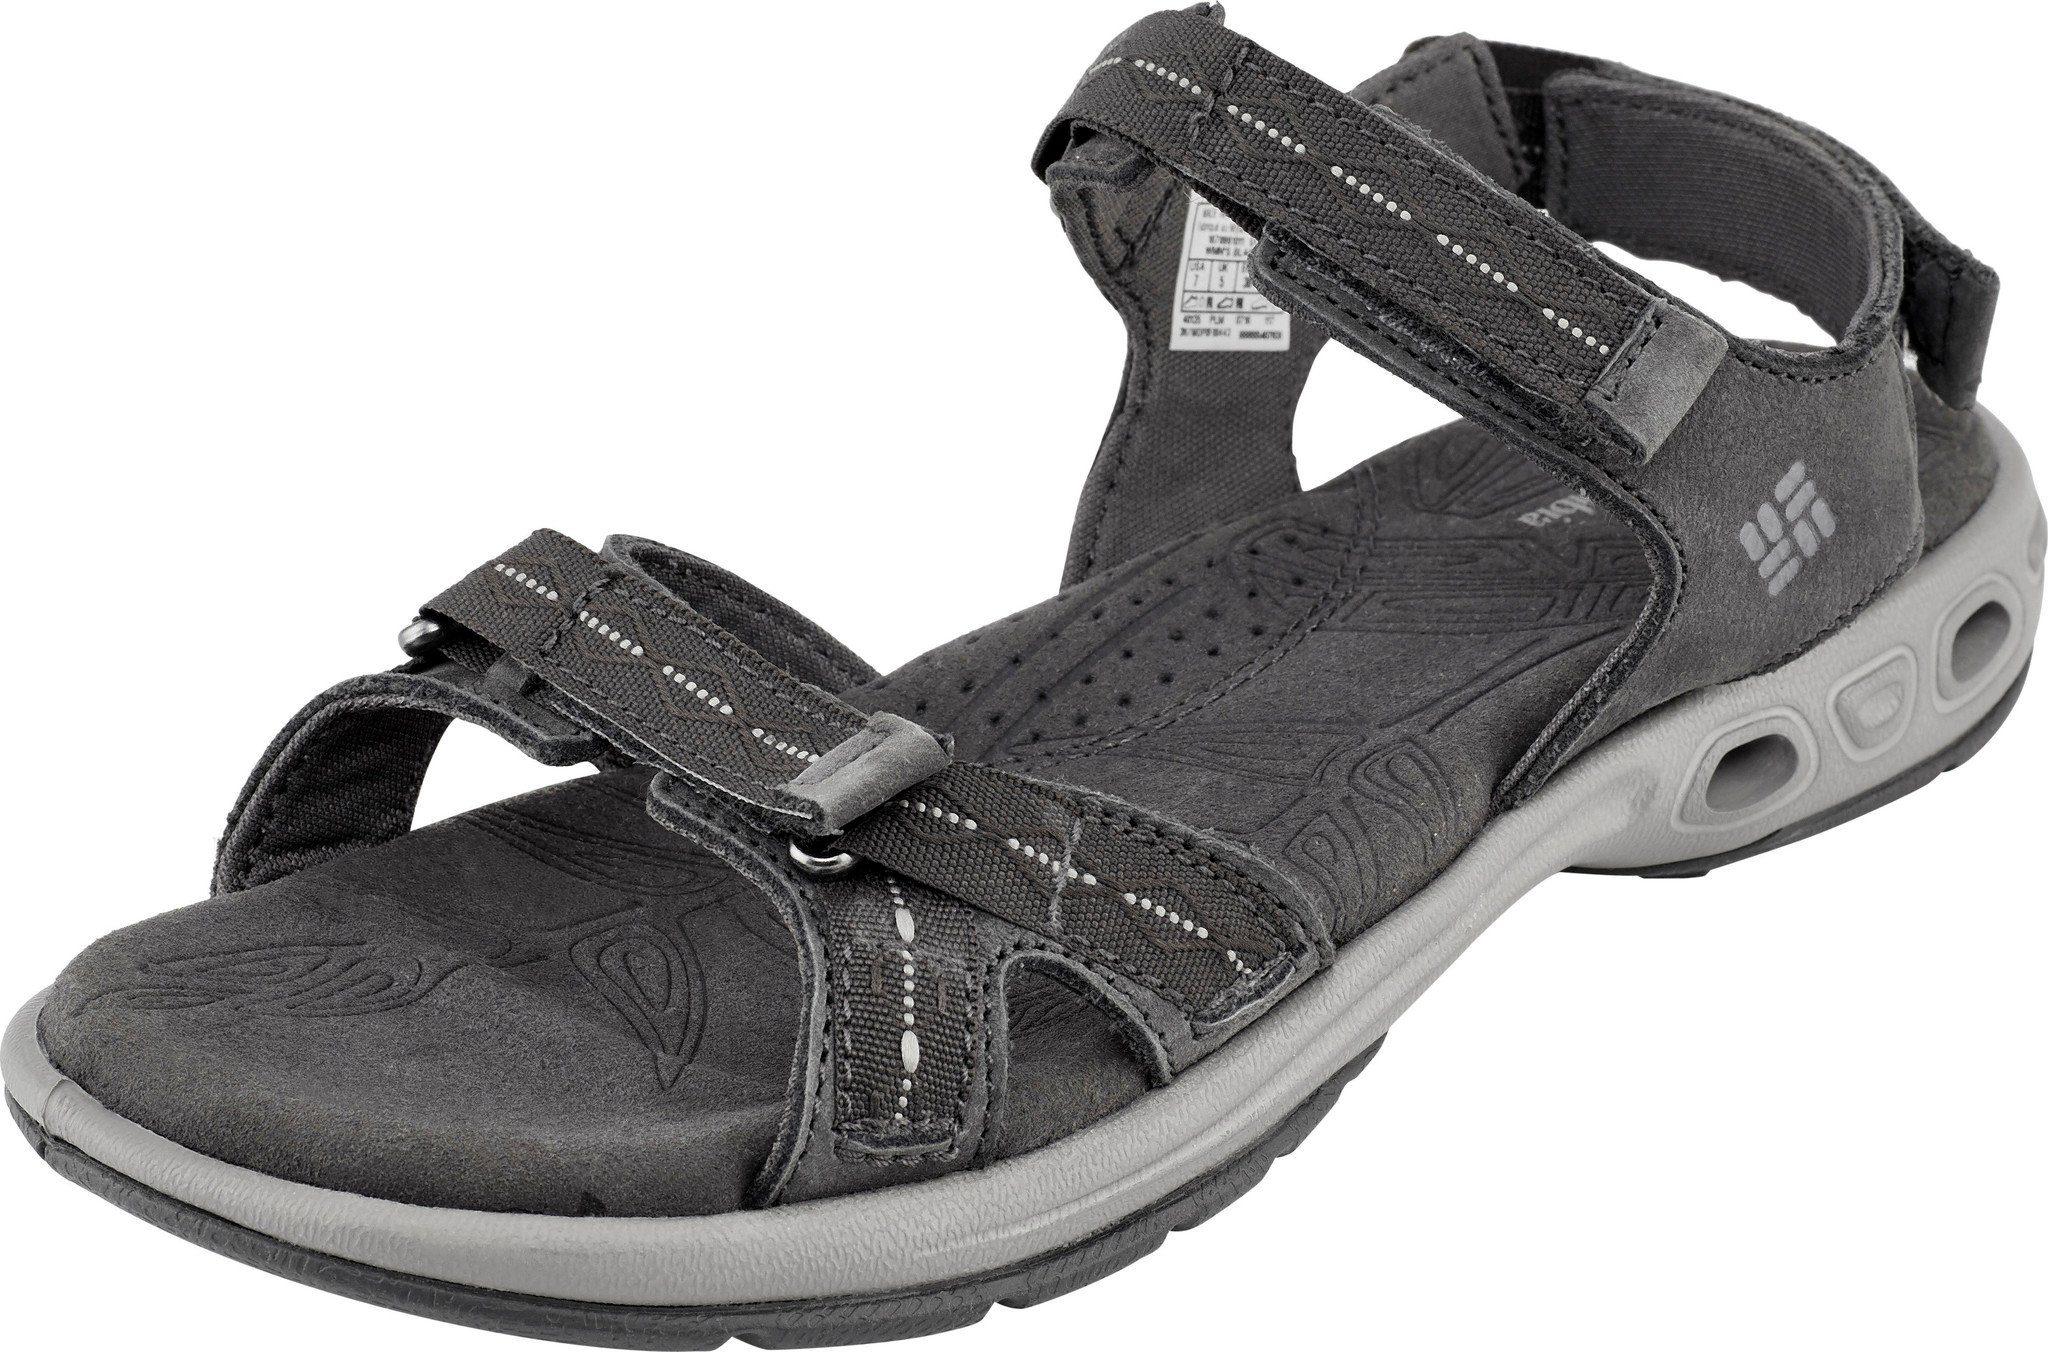 Columbia Sandale Kyra Vent II Shoes Women kaufen  grau